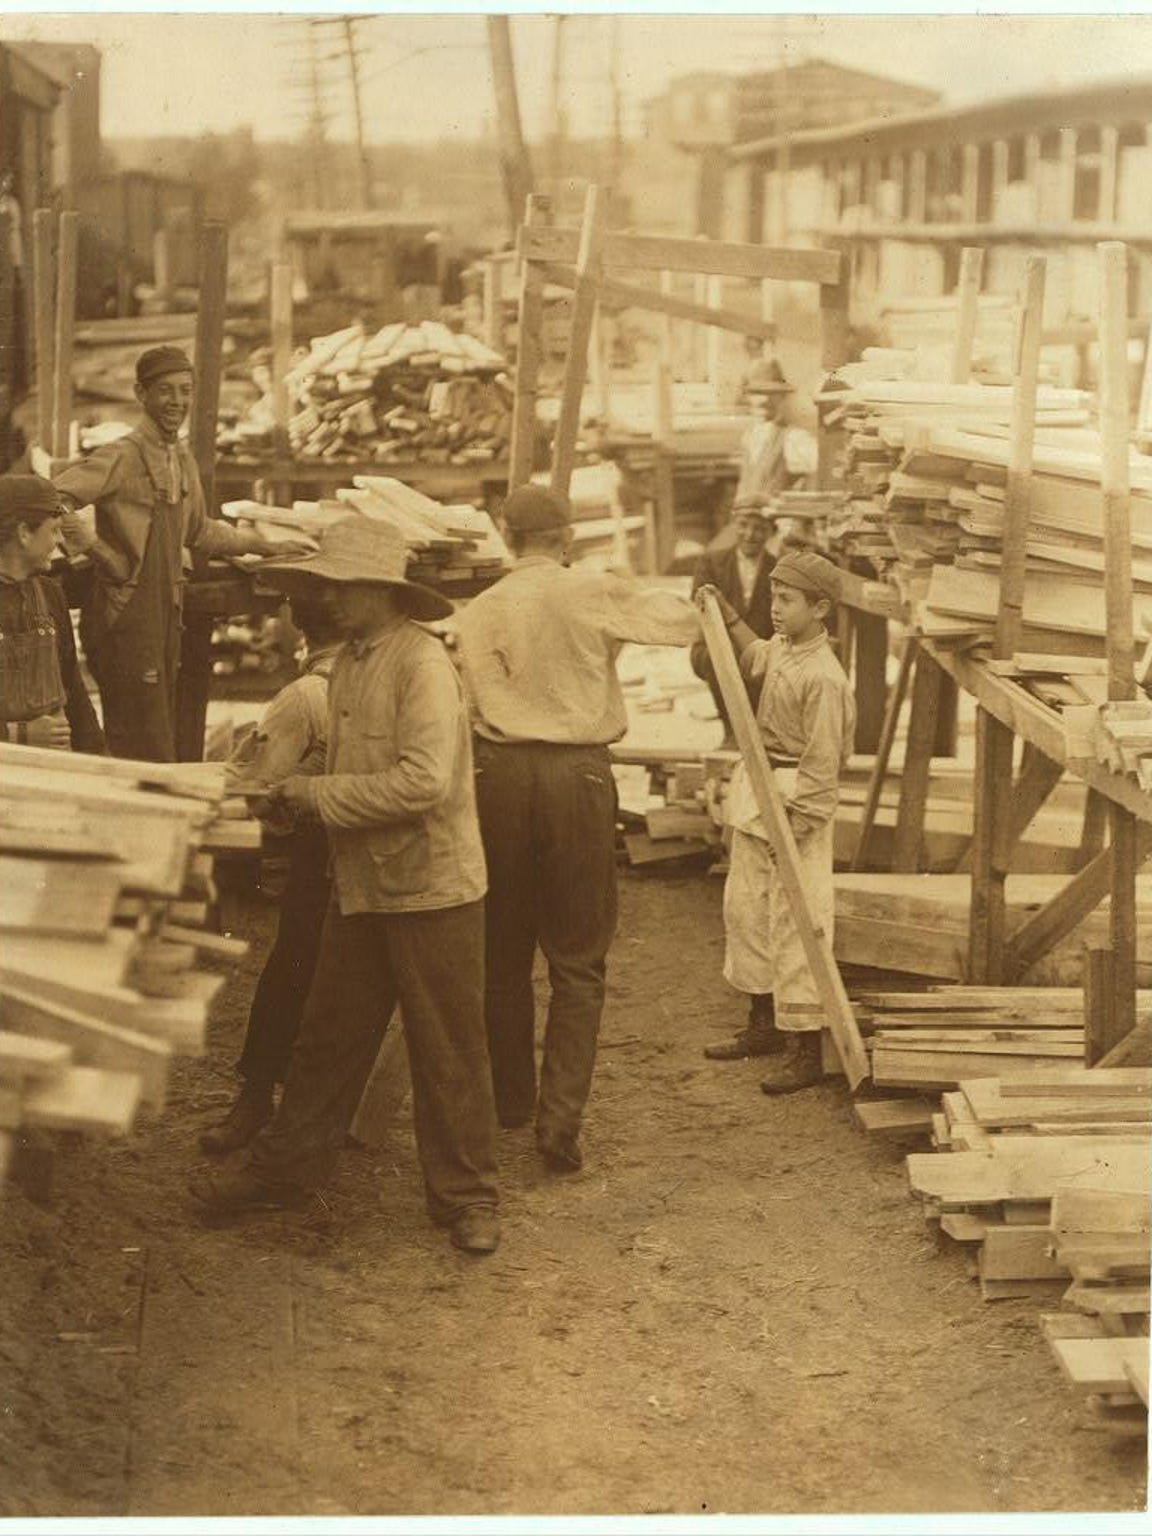 Image 5 - Boys at Hickock Lumber Co., Burlington VT, Lewis W. Hine, 1910 Lib